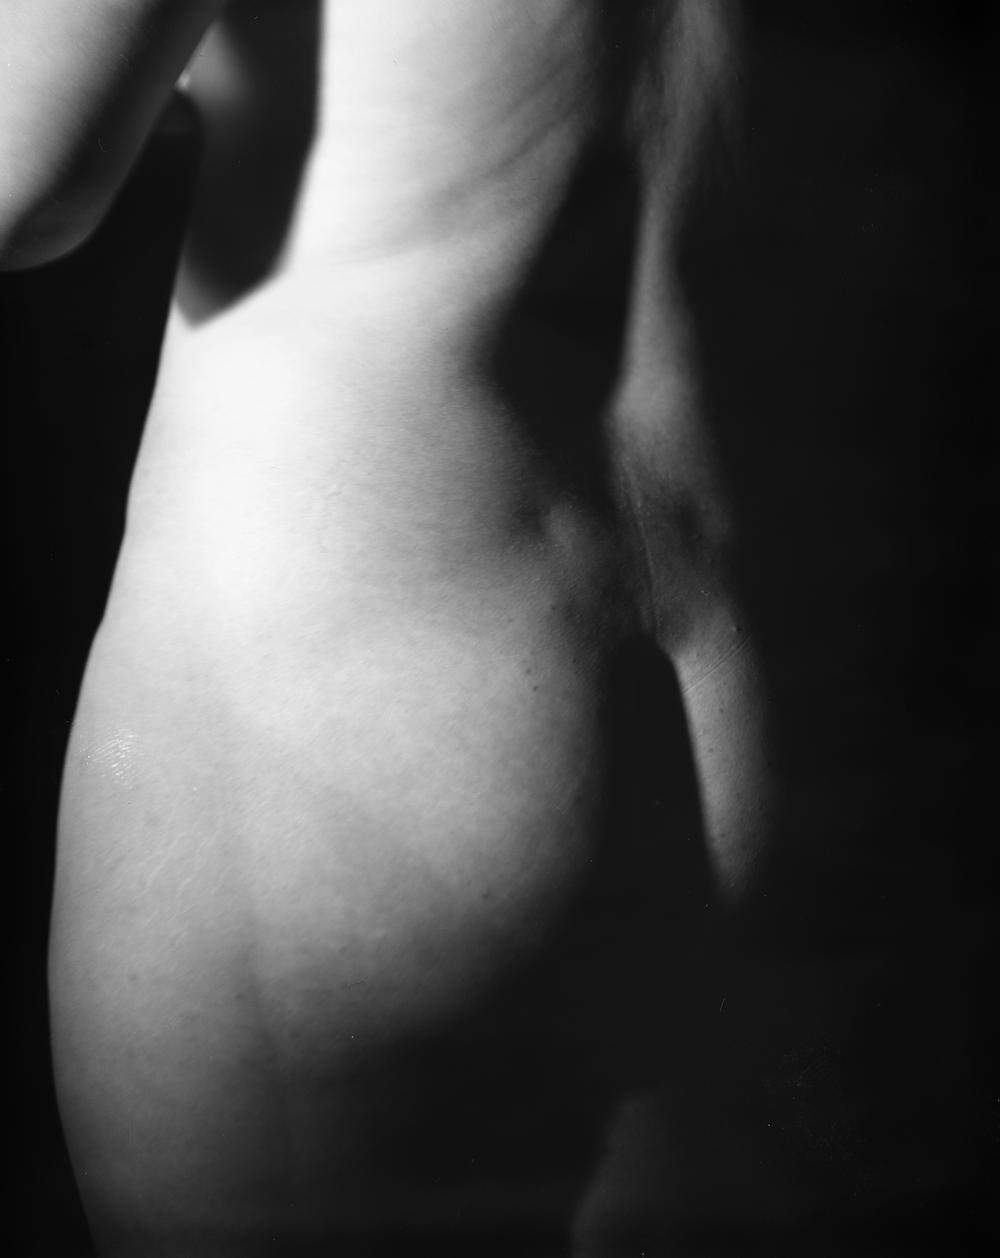 photo & form (4x5)